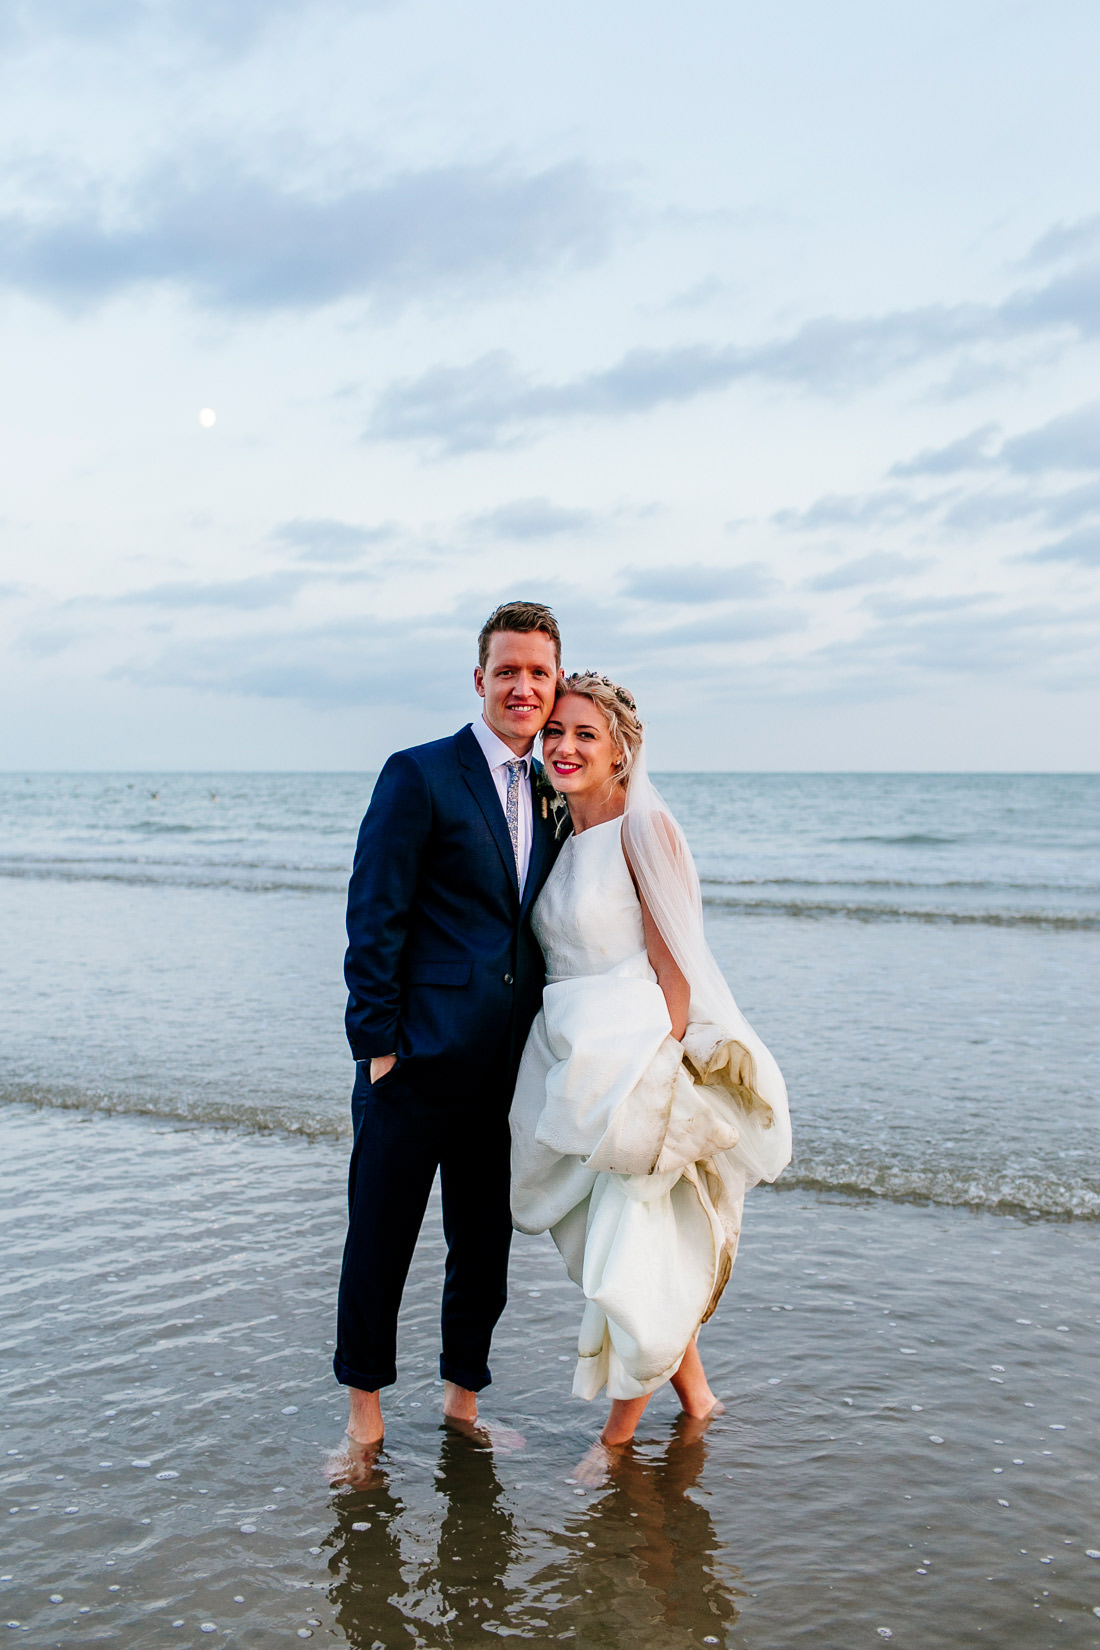 The-Gallivant-Camber-Sands-Beach-Kent-wedding-photographer-Epic-Love-Story-133